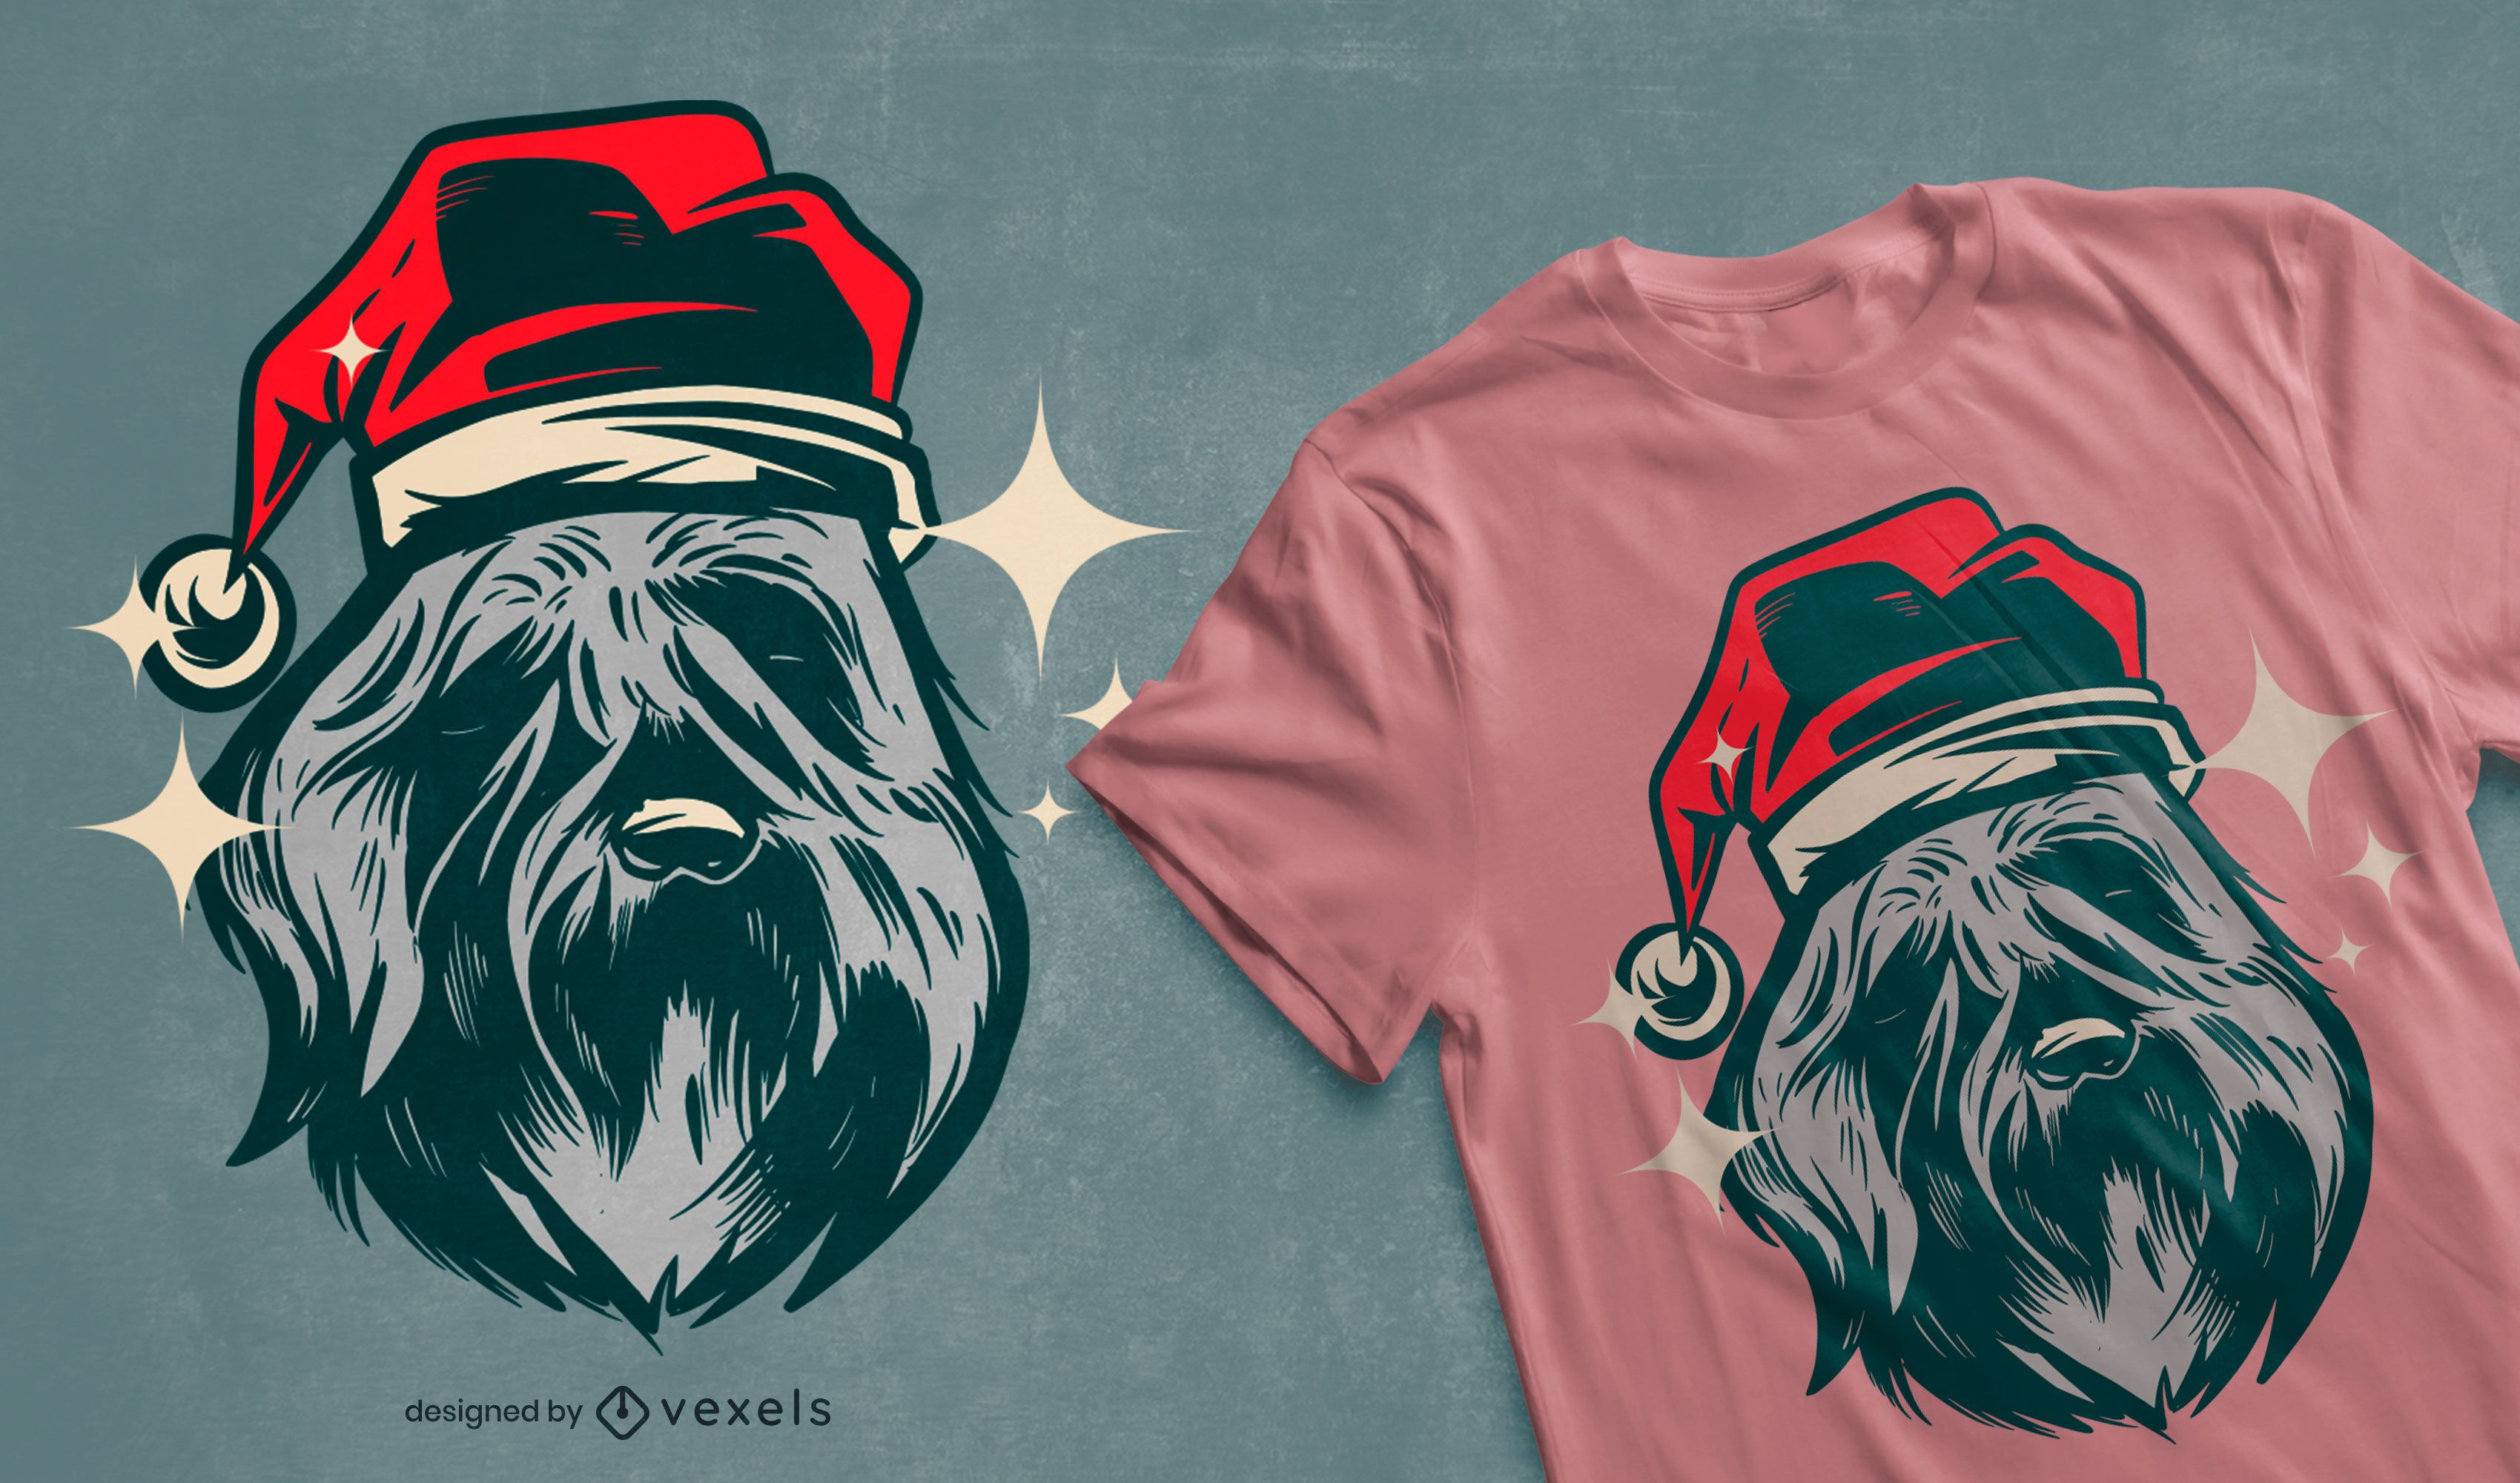 Bouvier des flandres christmas t-shirt design